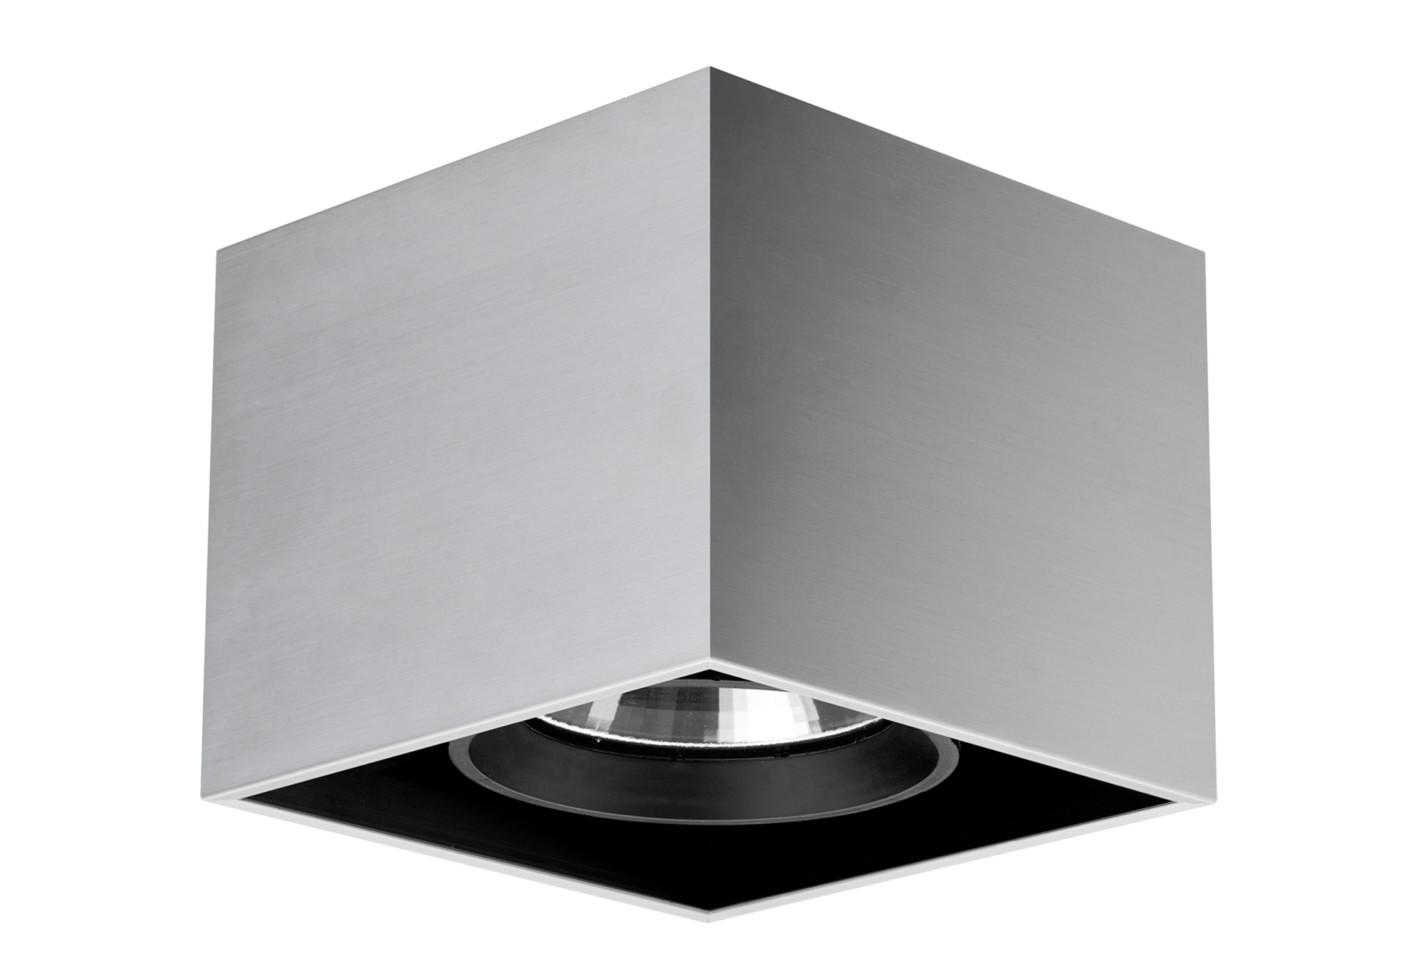 flos compass box compass box 1 ceiling lamp flos compass box 4 square ceiling lamp flos flos. Black Bedroom Furniture Sets. Home Design Ideas